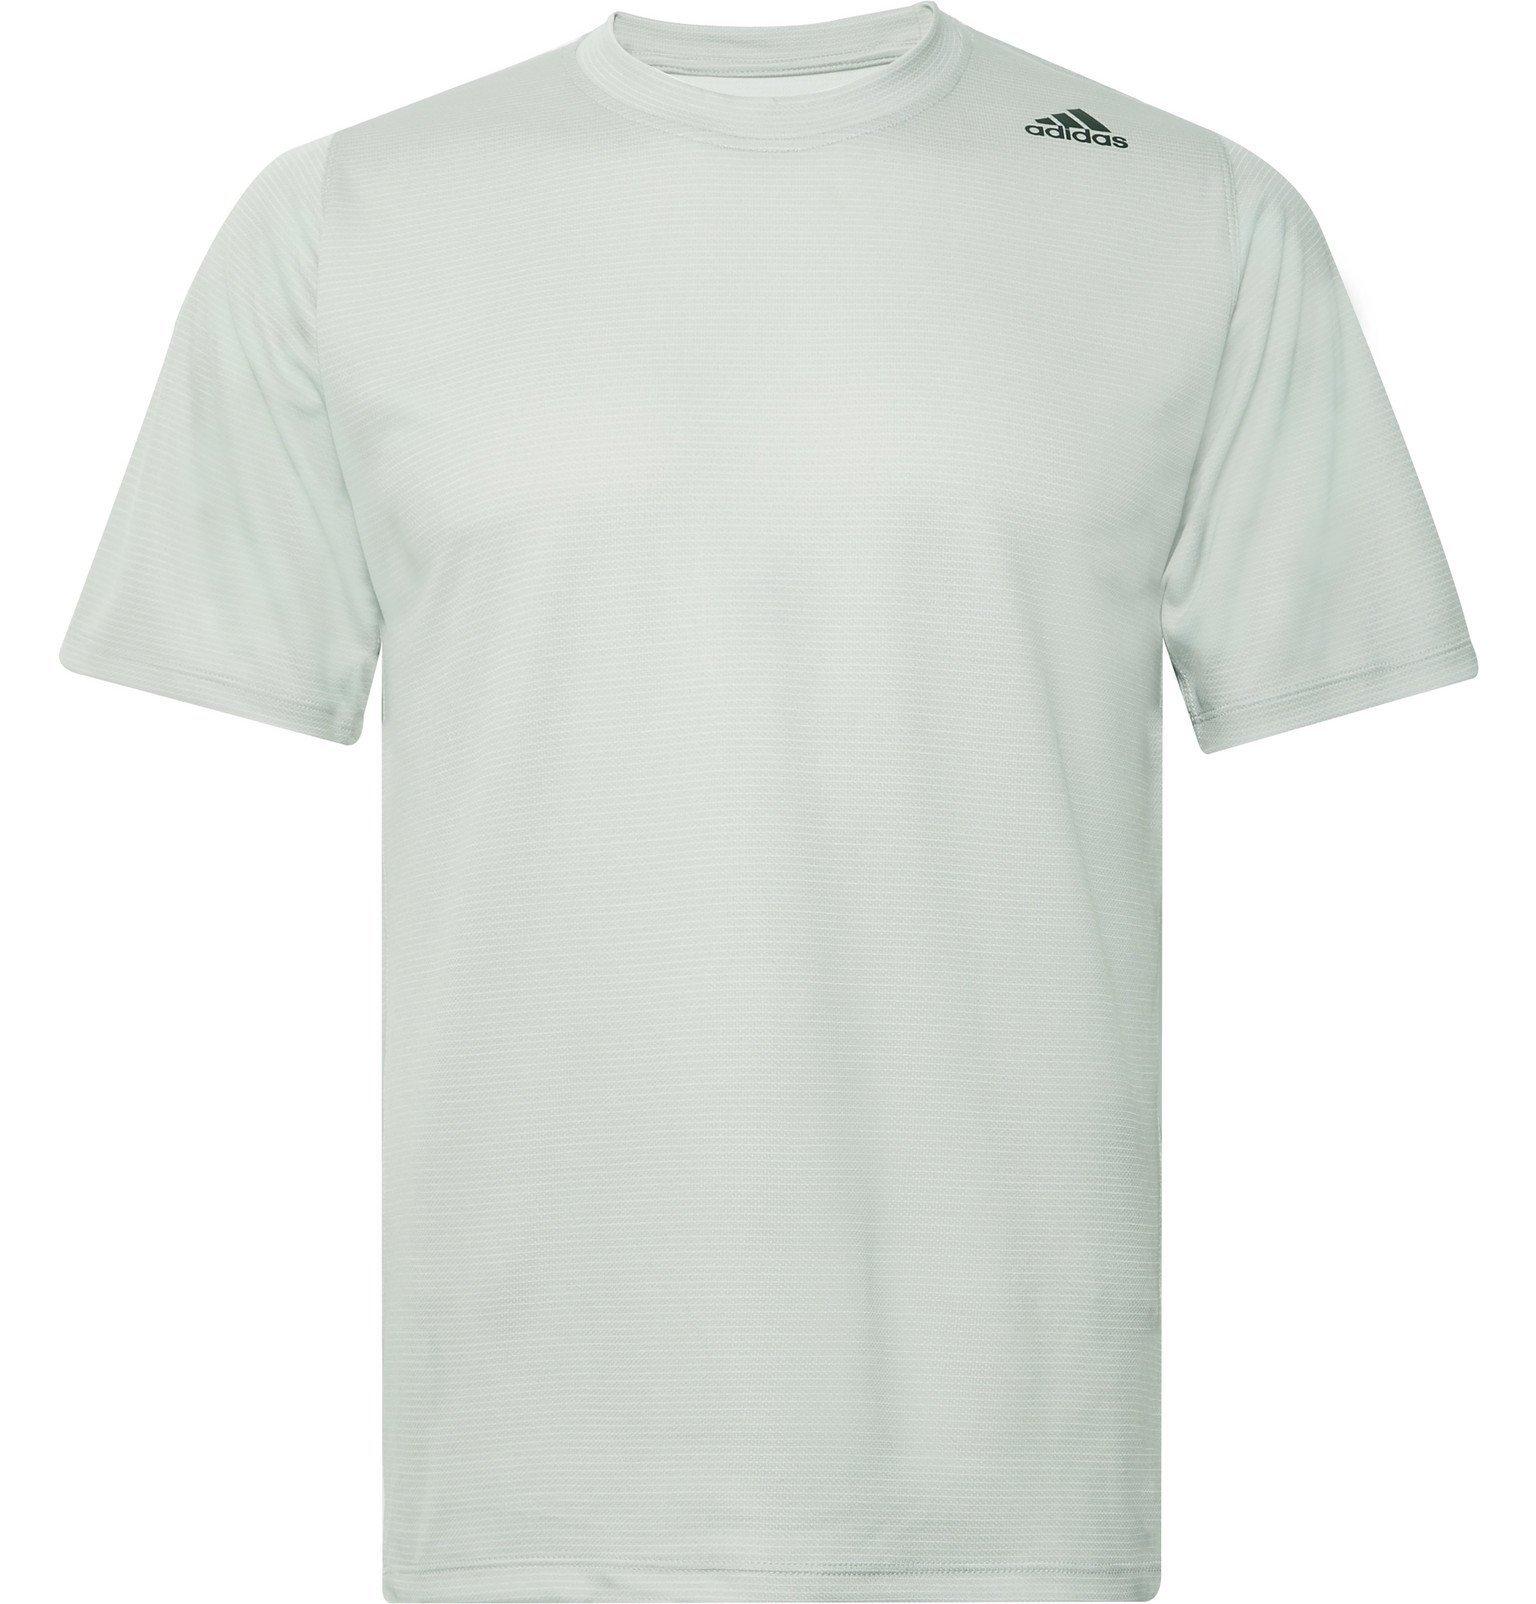 Adidas Sport - FreeLift Tech Striped Climalite T-Shirt - Gray